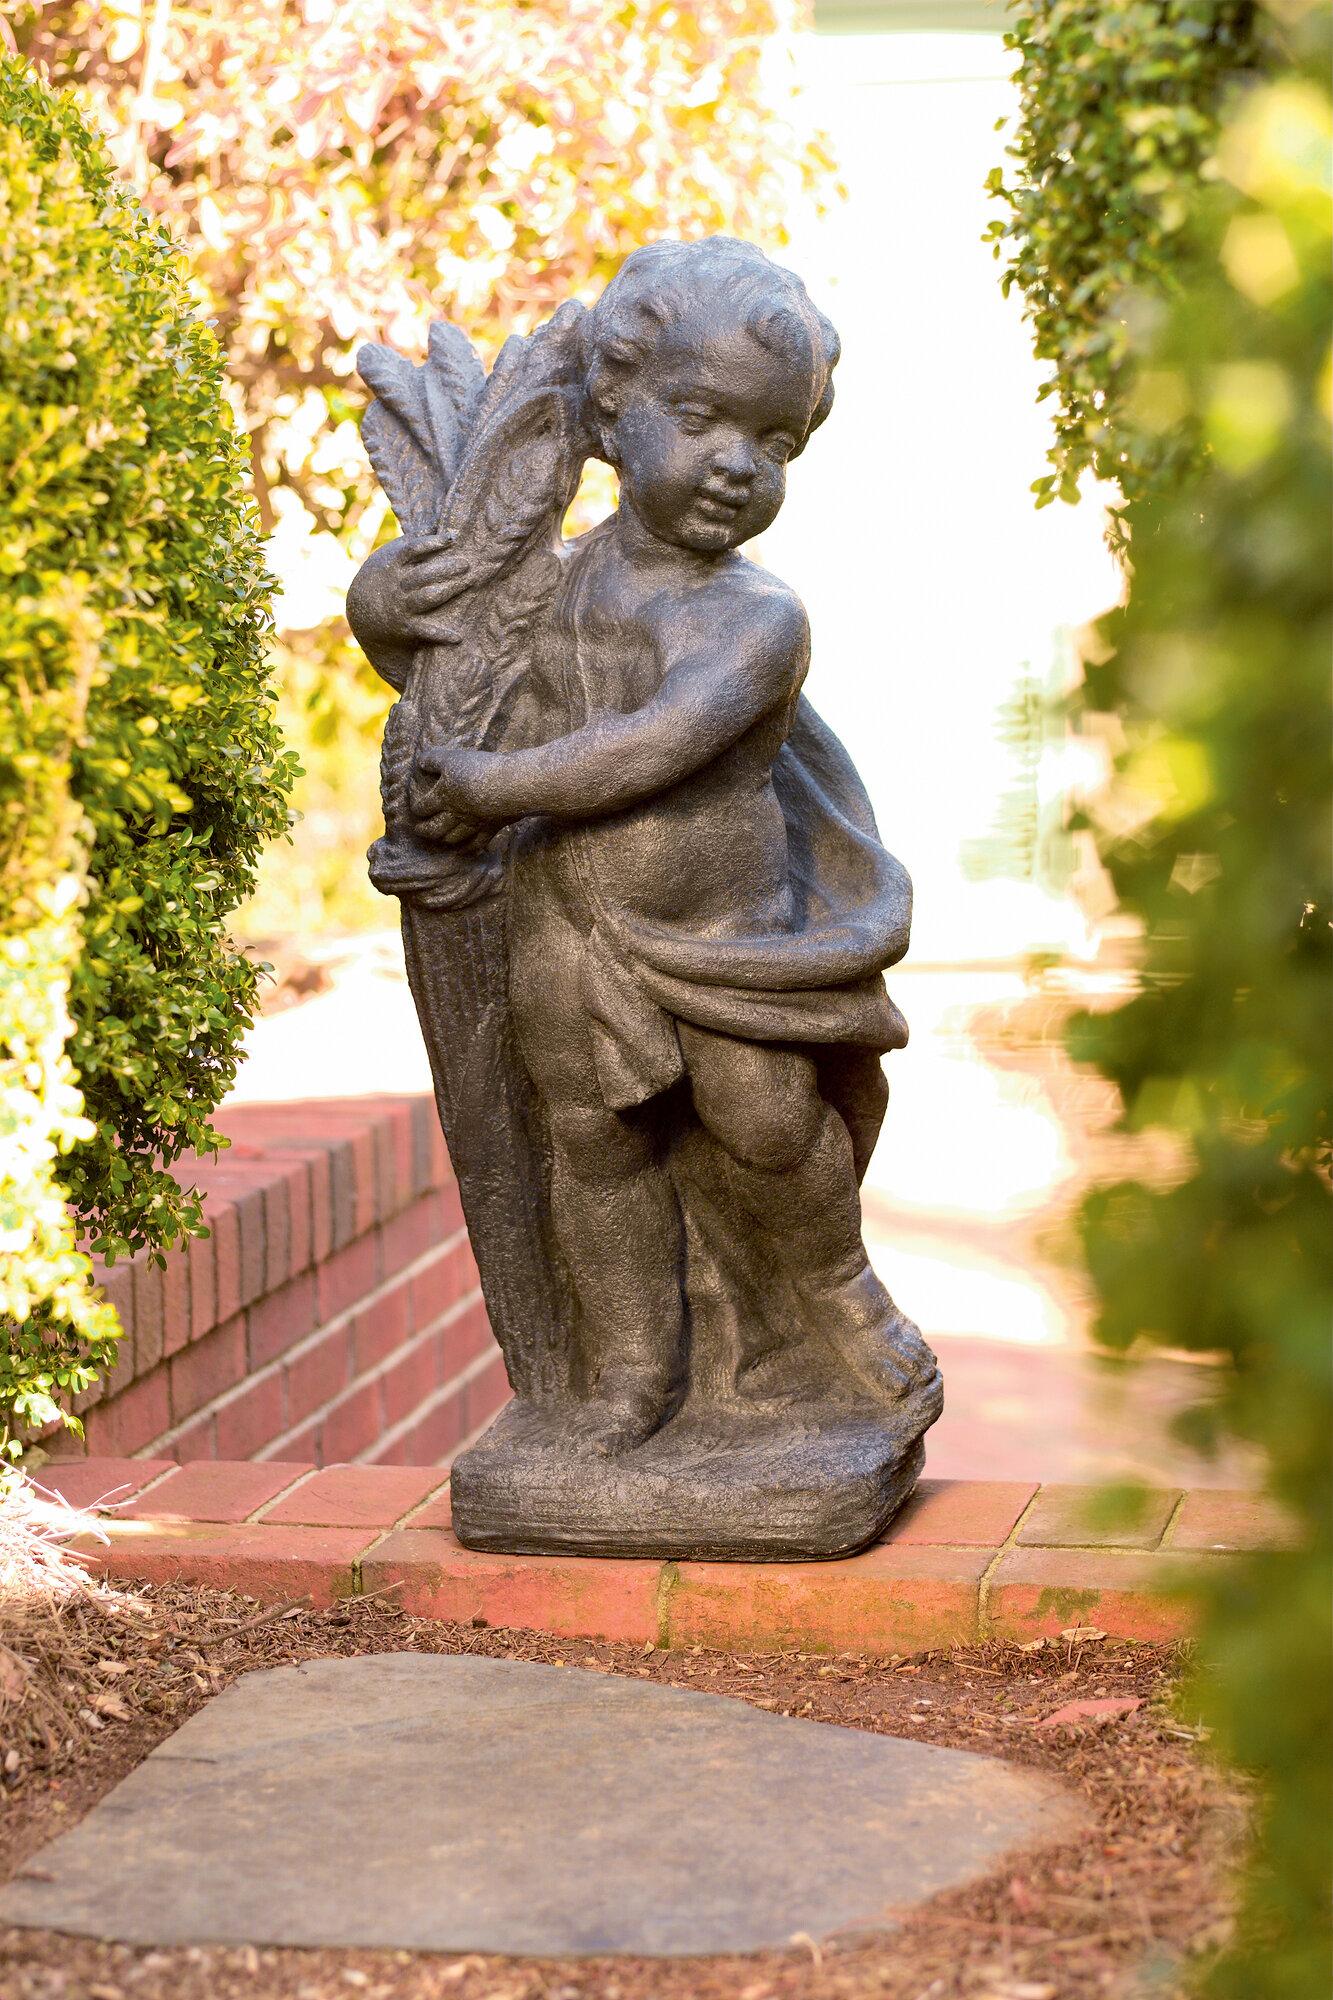 Ladybug Garden Decor Cherubs Statue. OUR SKU# LDYB1117 | MPN: 80212L